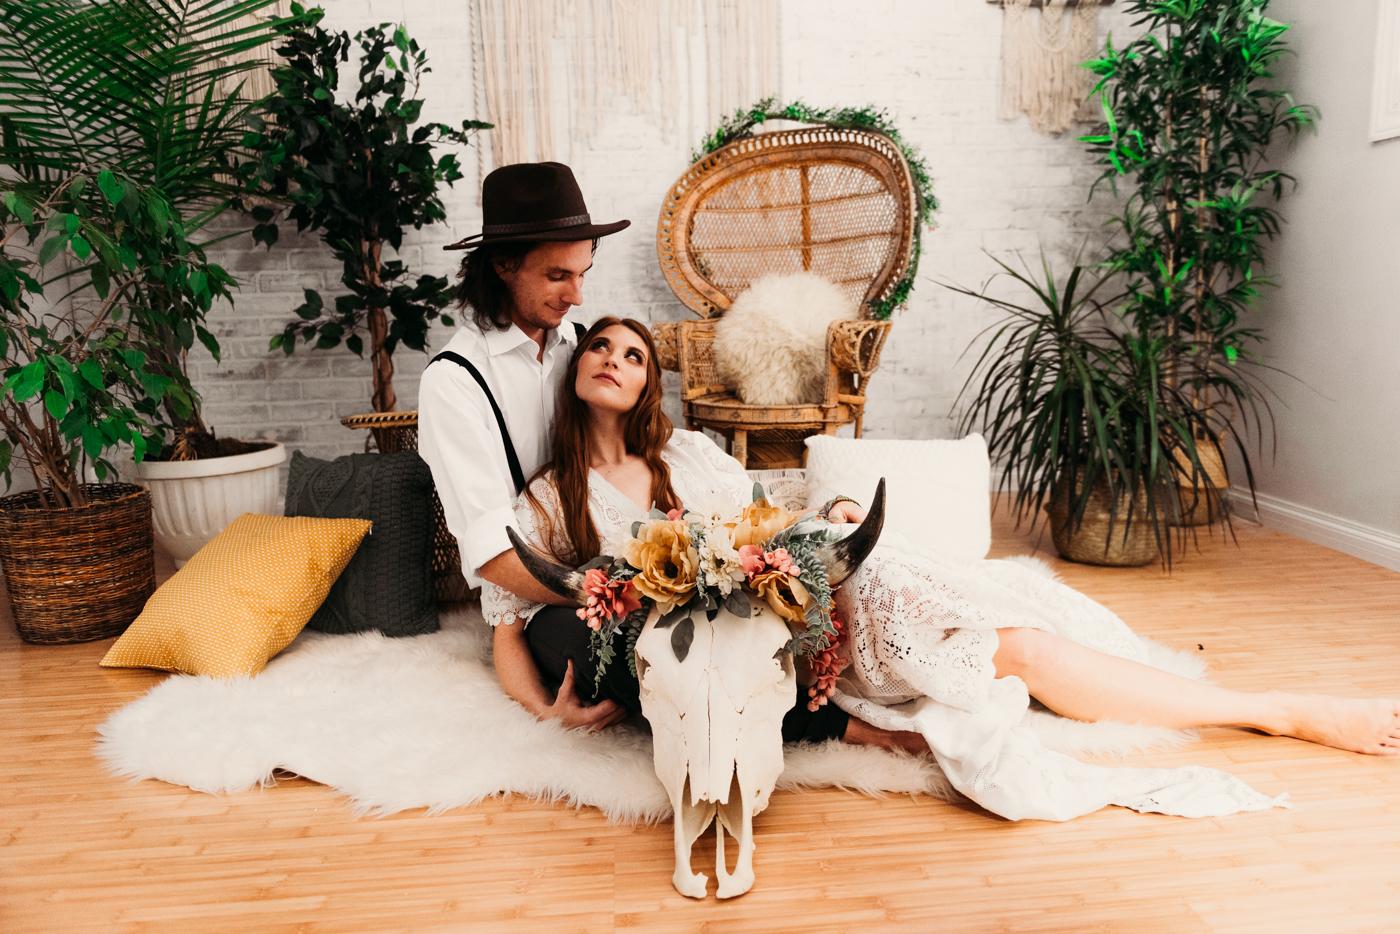 FortSt.John_photographer_TyraEPhotography_Wedding_Couple_Family_Photograhy_DawsonCreek_Elopement_Bride_Boduoir_Portraits-2.jpg